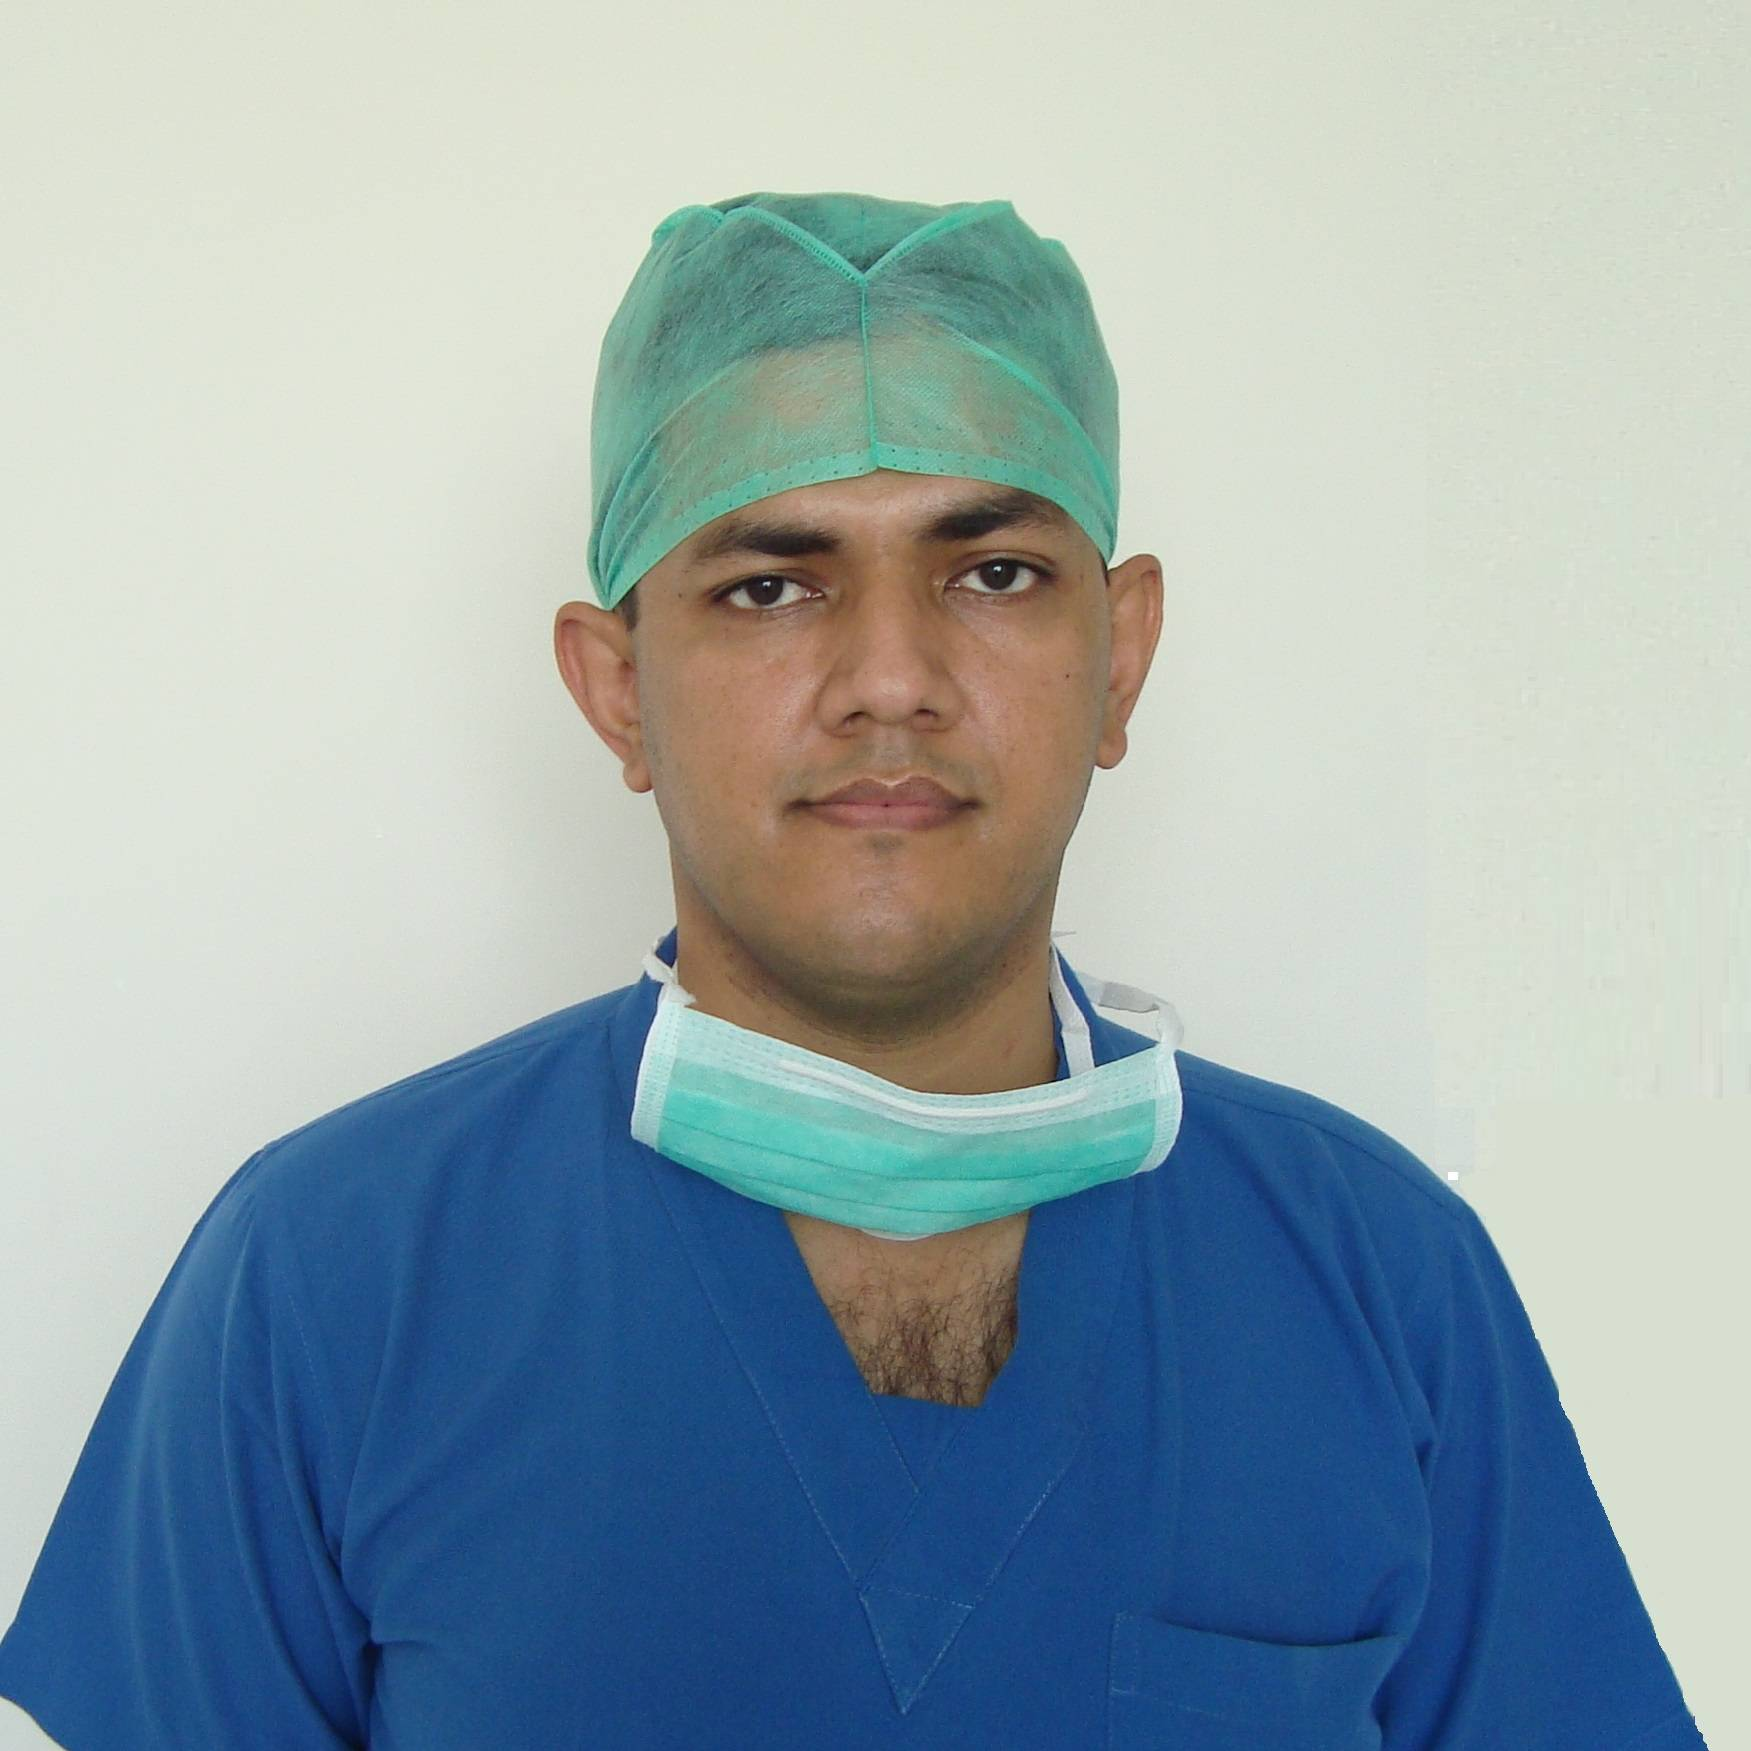 Dr. Vivek Vaid